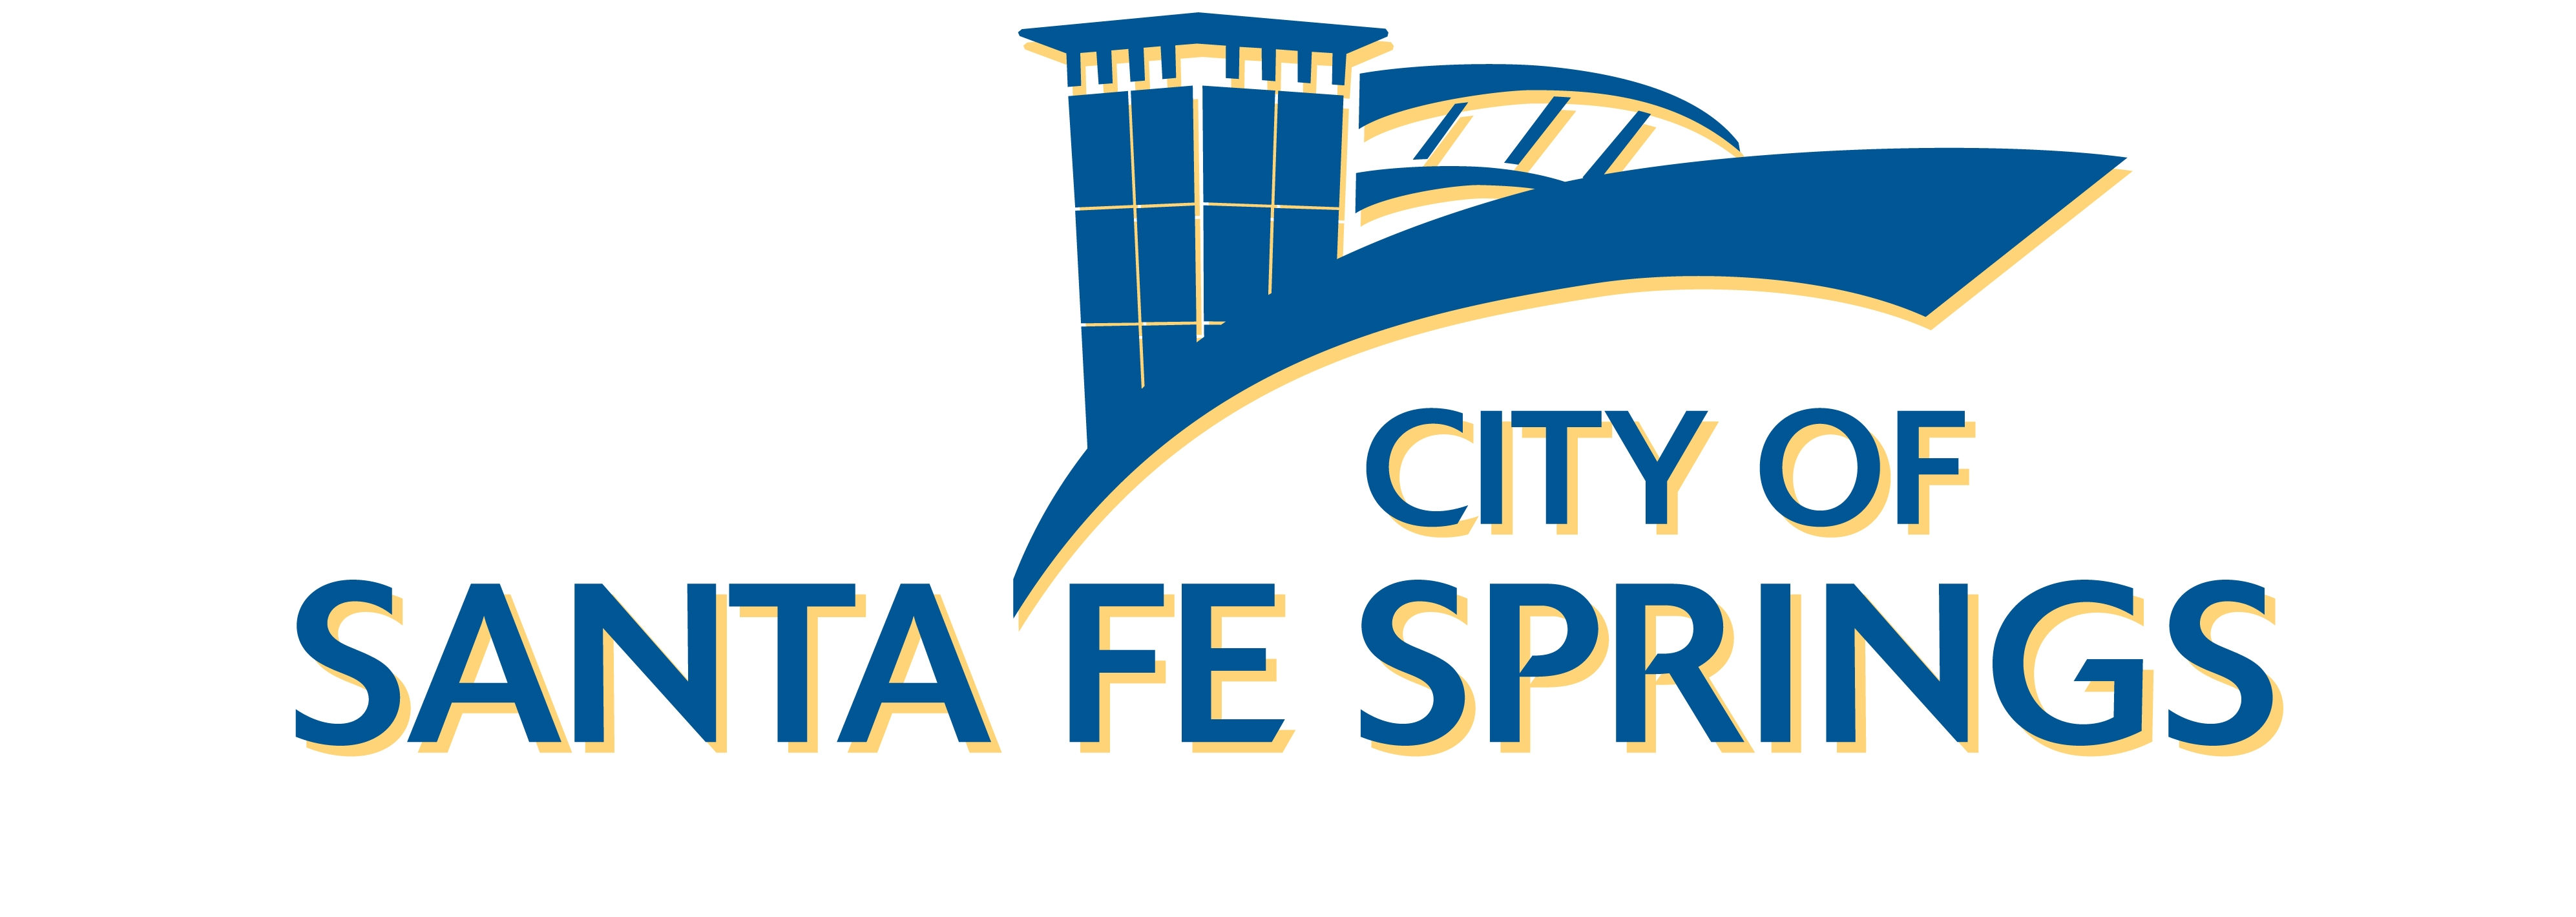 city-of-santa-fe-springs_logo